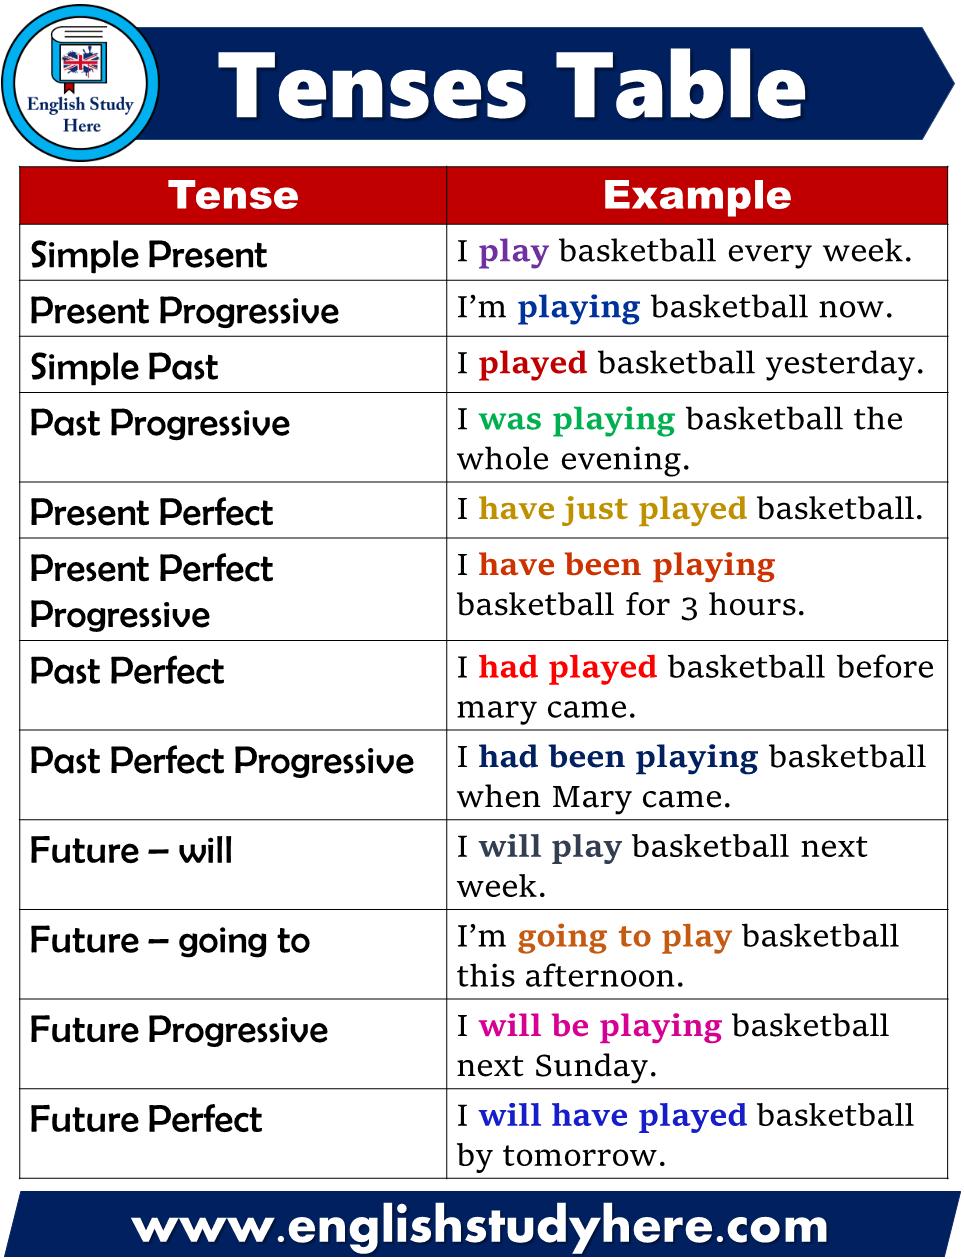 English Tense Tables 12 Tenses In English English Study Here Teaching English Grammar English Study English Grammar [ 1259 x 964 Pixel ]